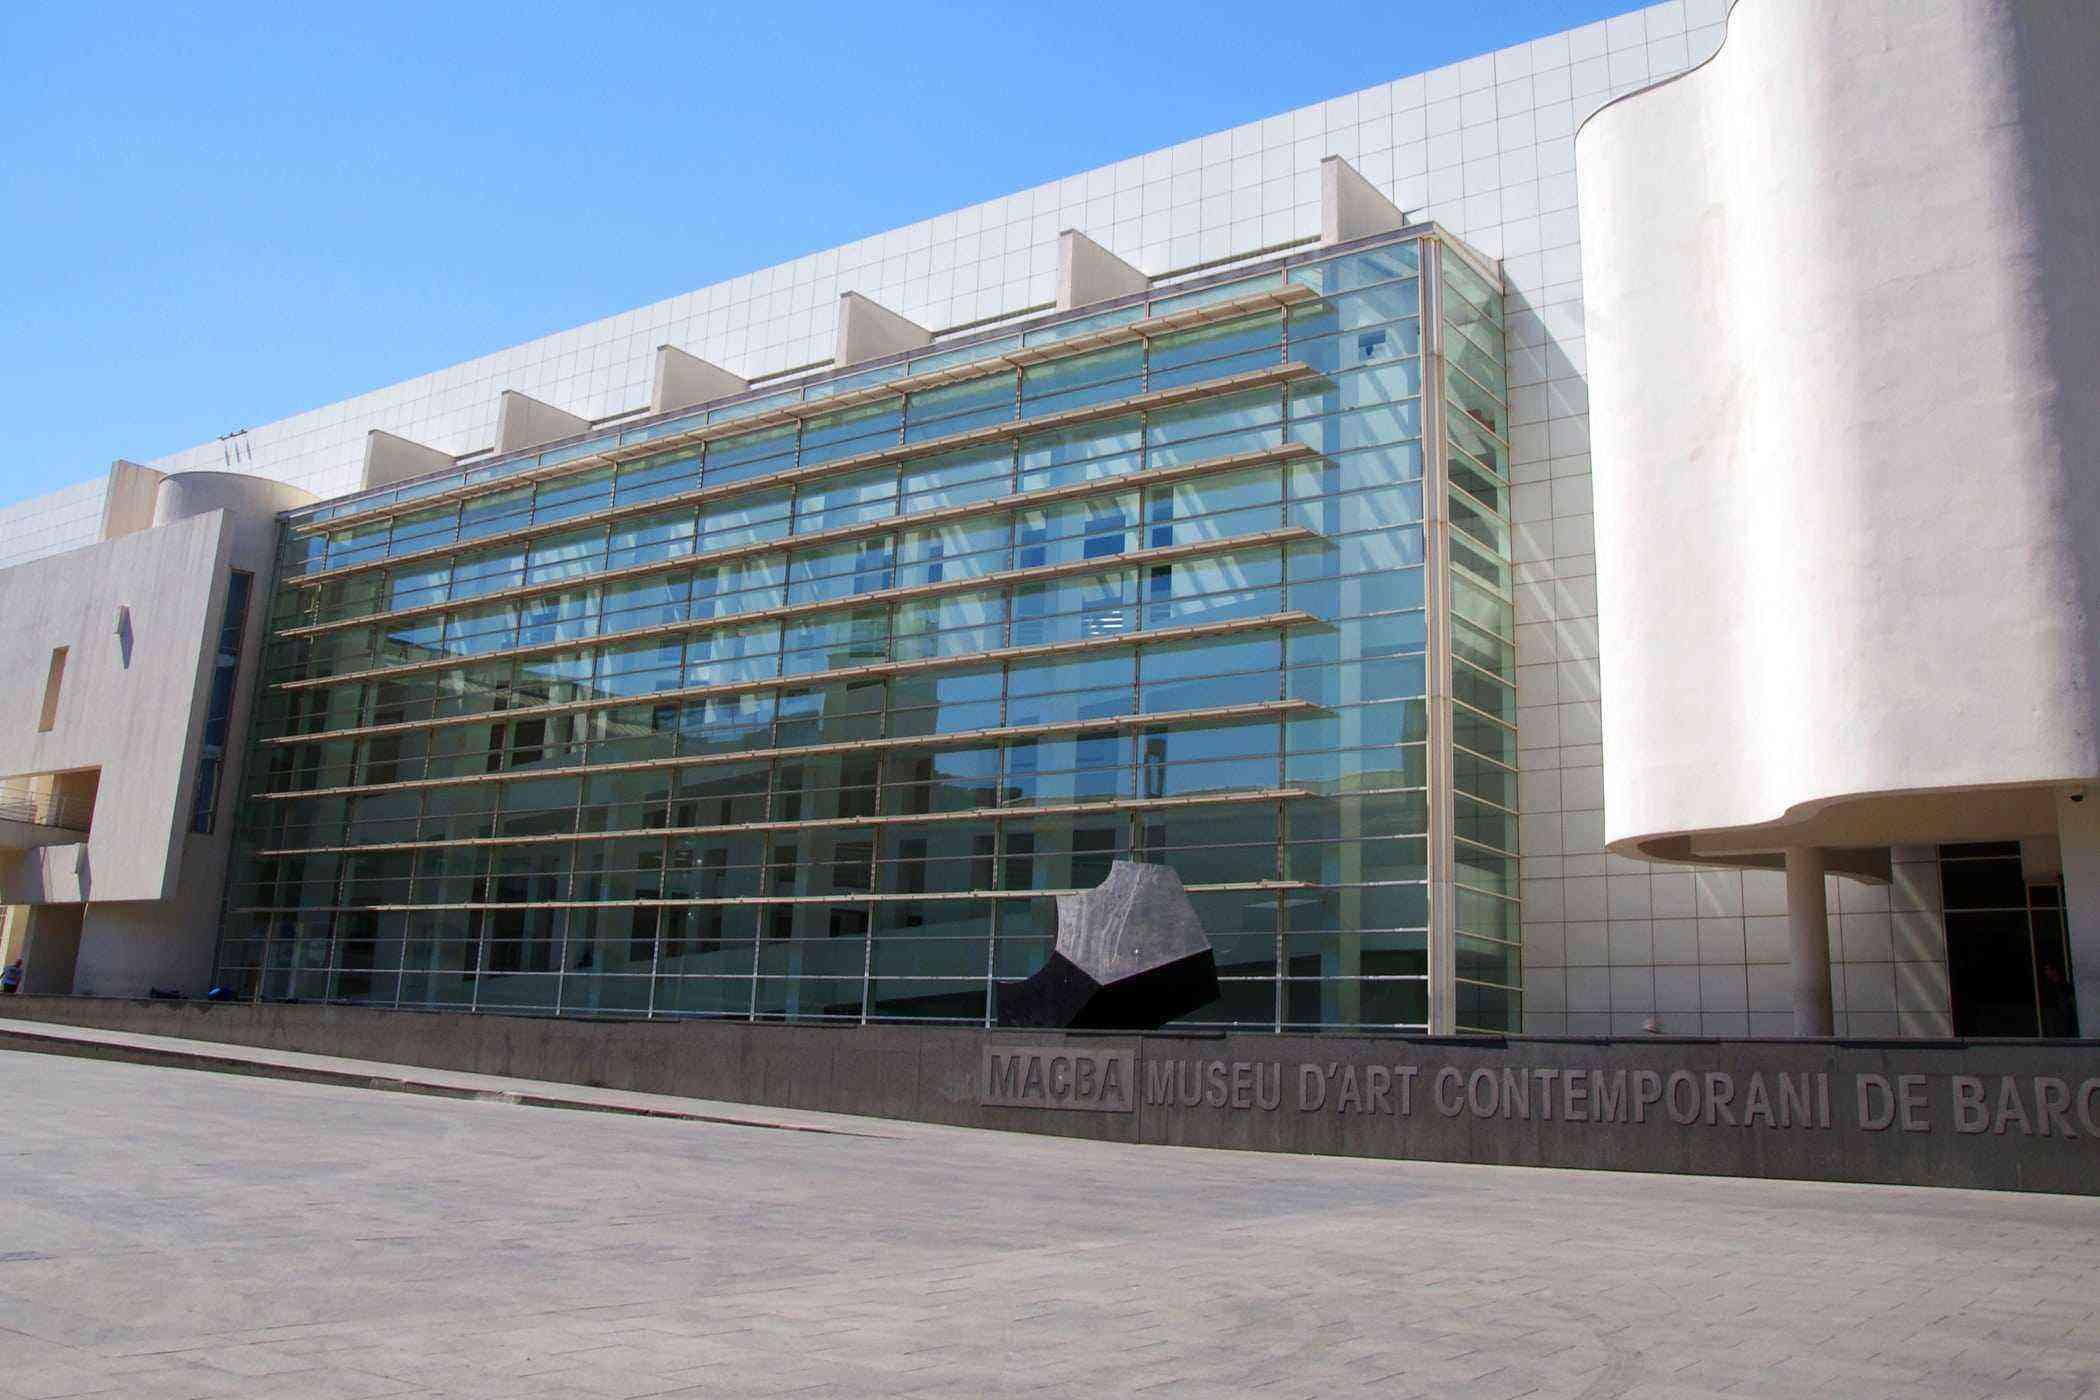 20 Museu d Art Contemporani de Barcelona